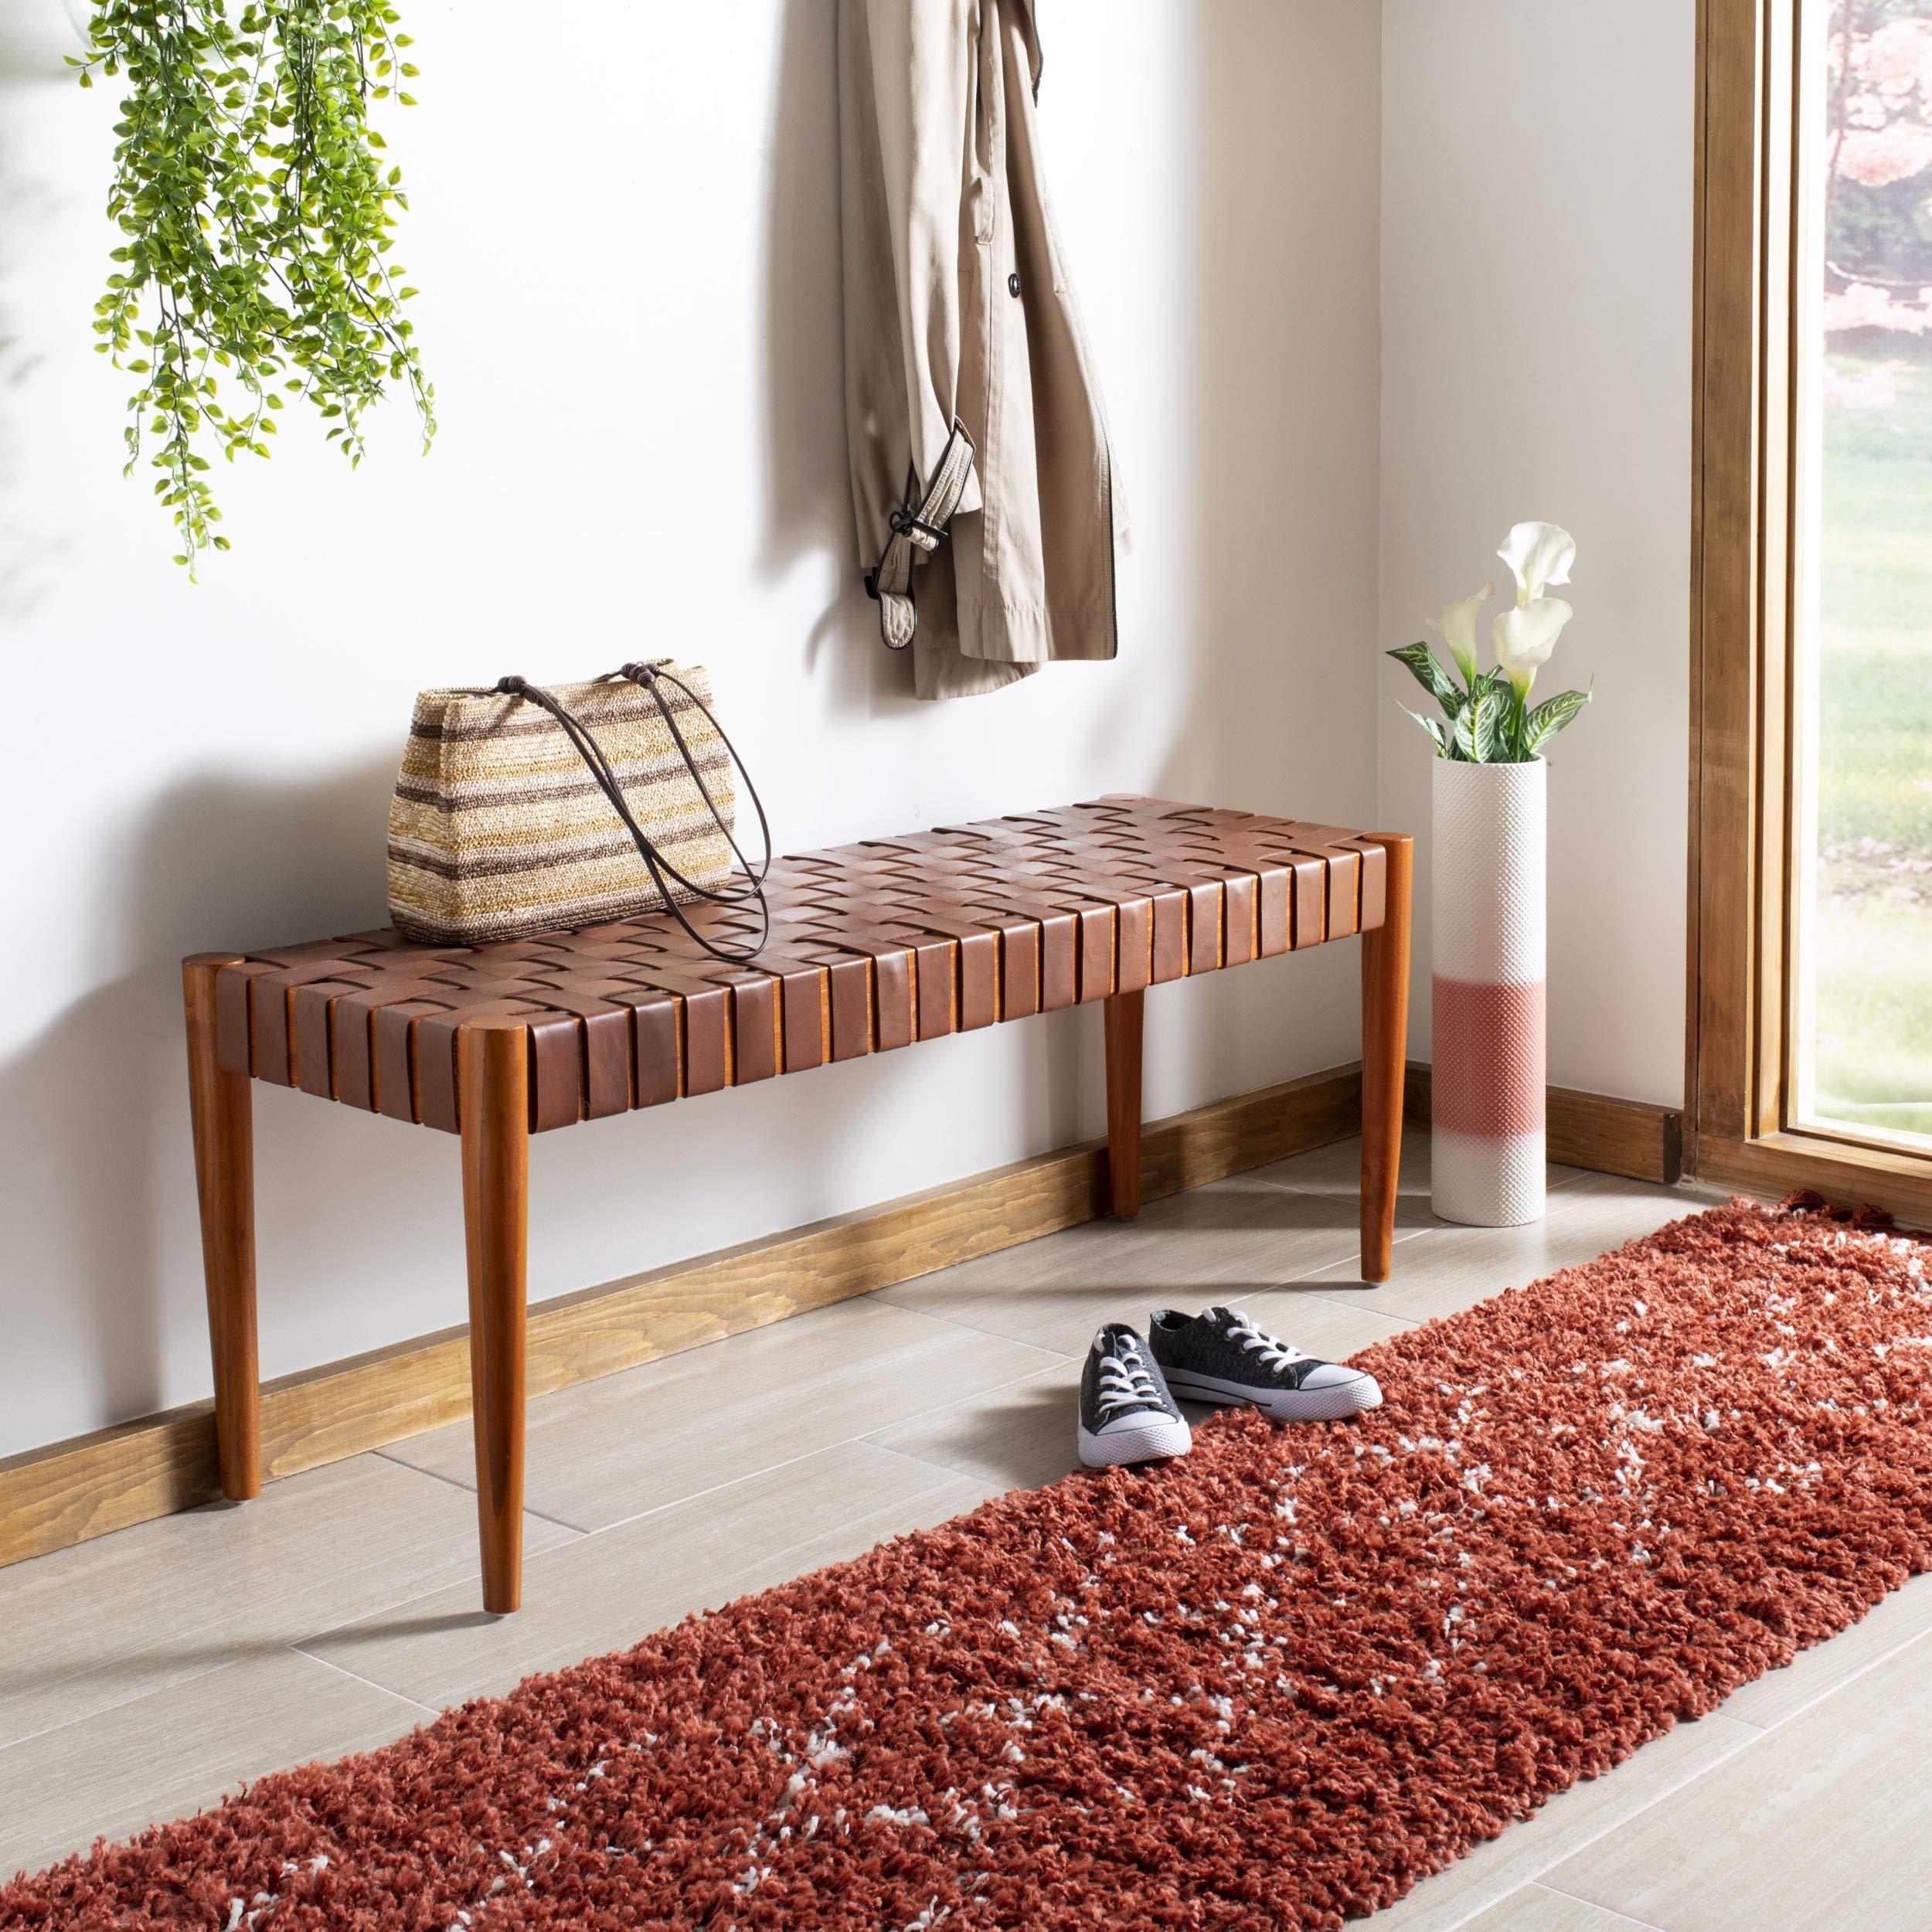 Safavieh Home Collection Amalia Bench, Cognac/Dark Brown by Safavieh